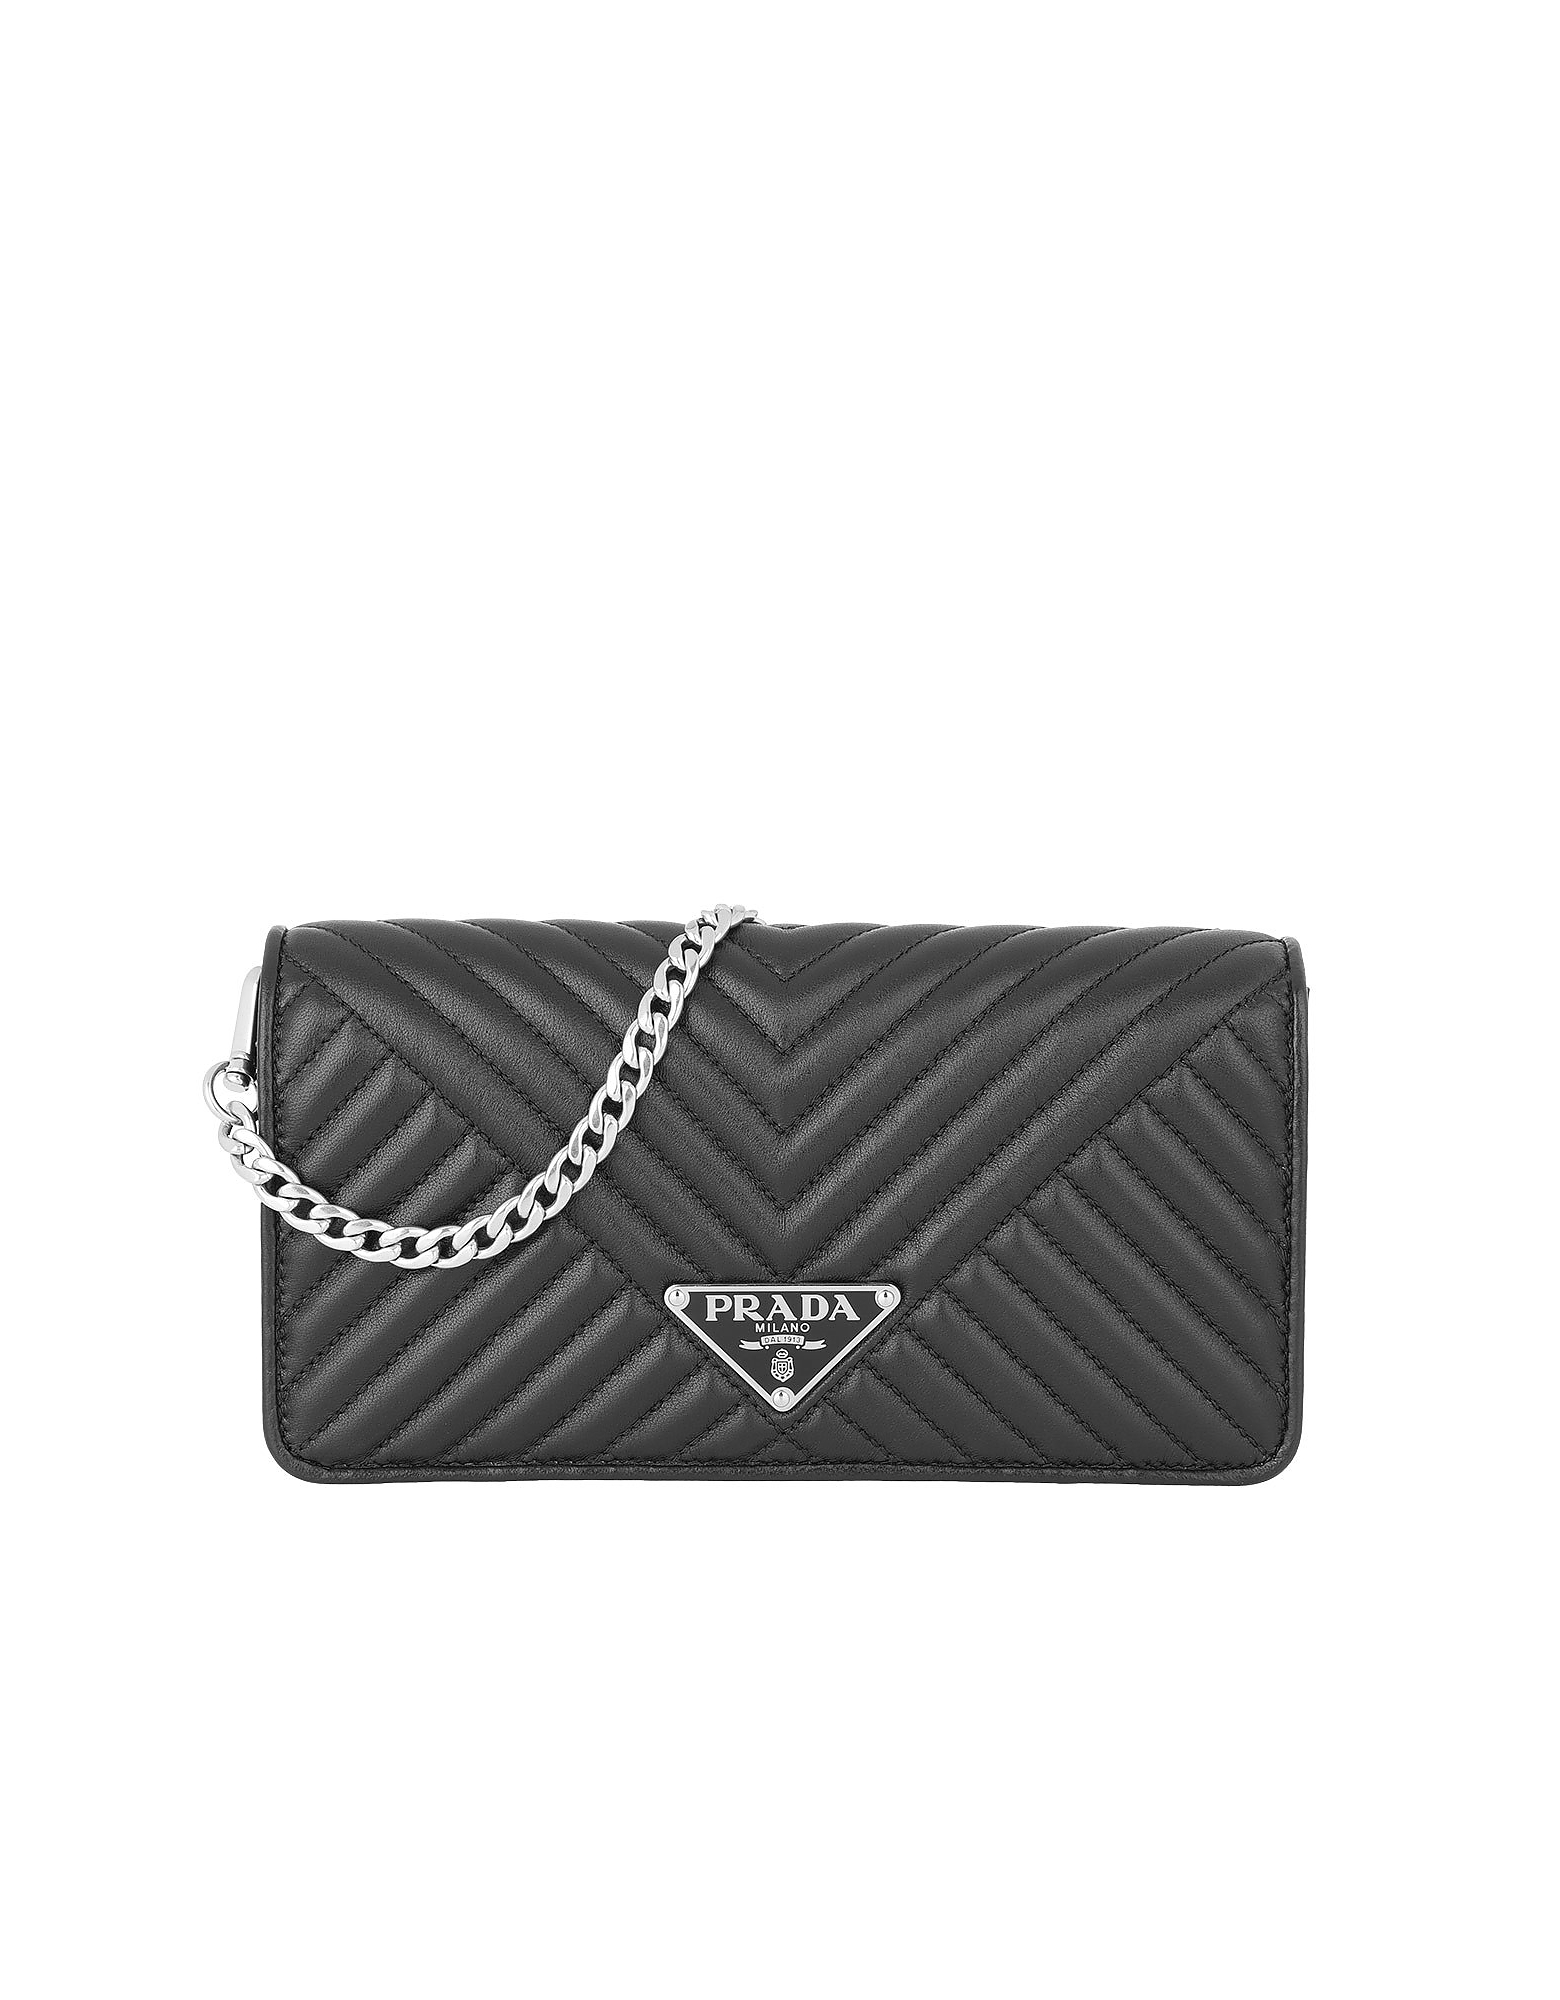 5d378df86067 Prada Crossbody Bag Mini Black | ModeSens